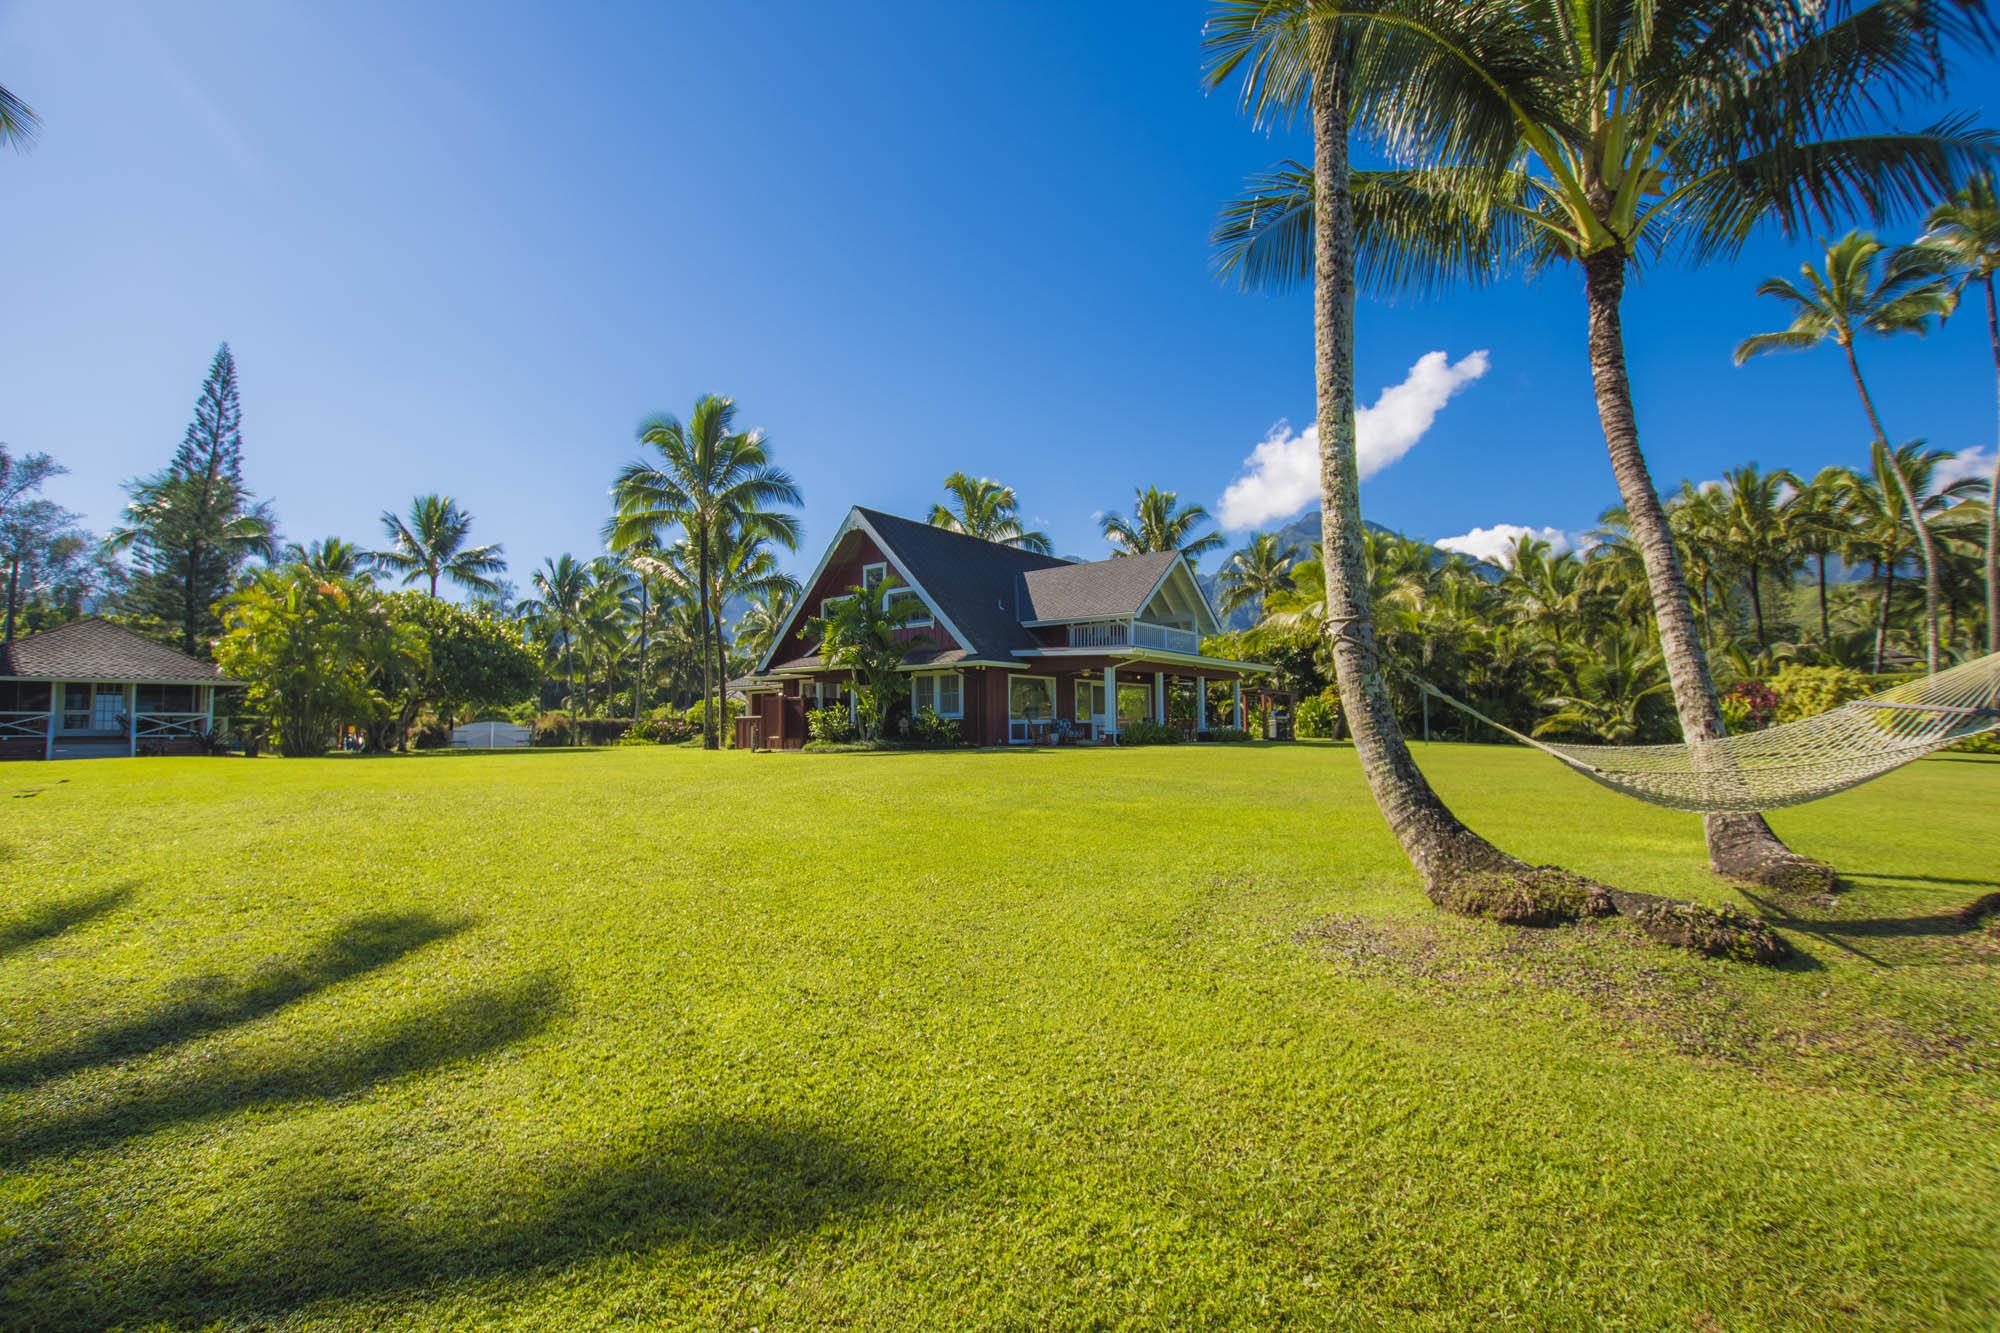 Kauai-217-Hanalei Bay31